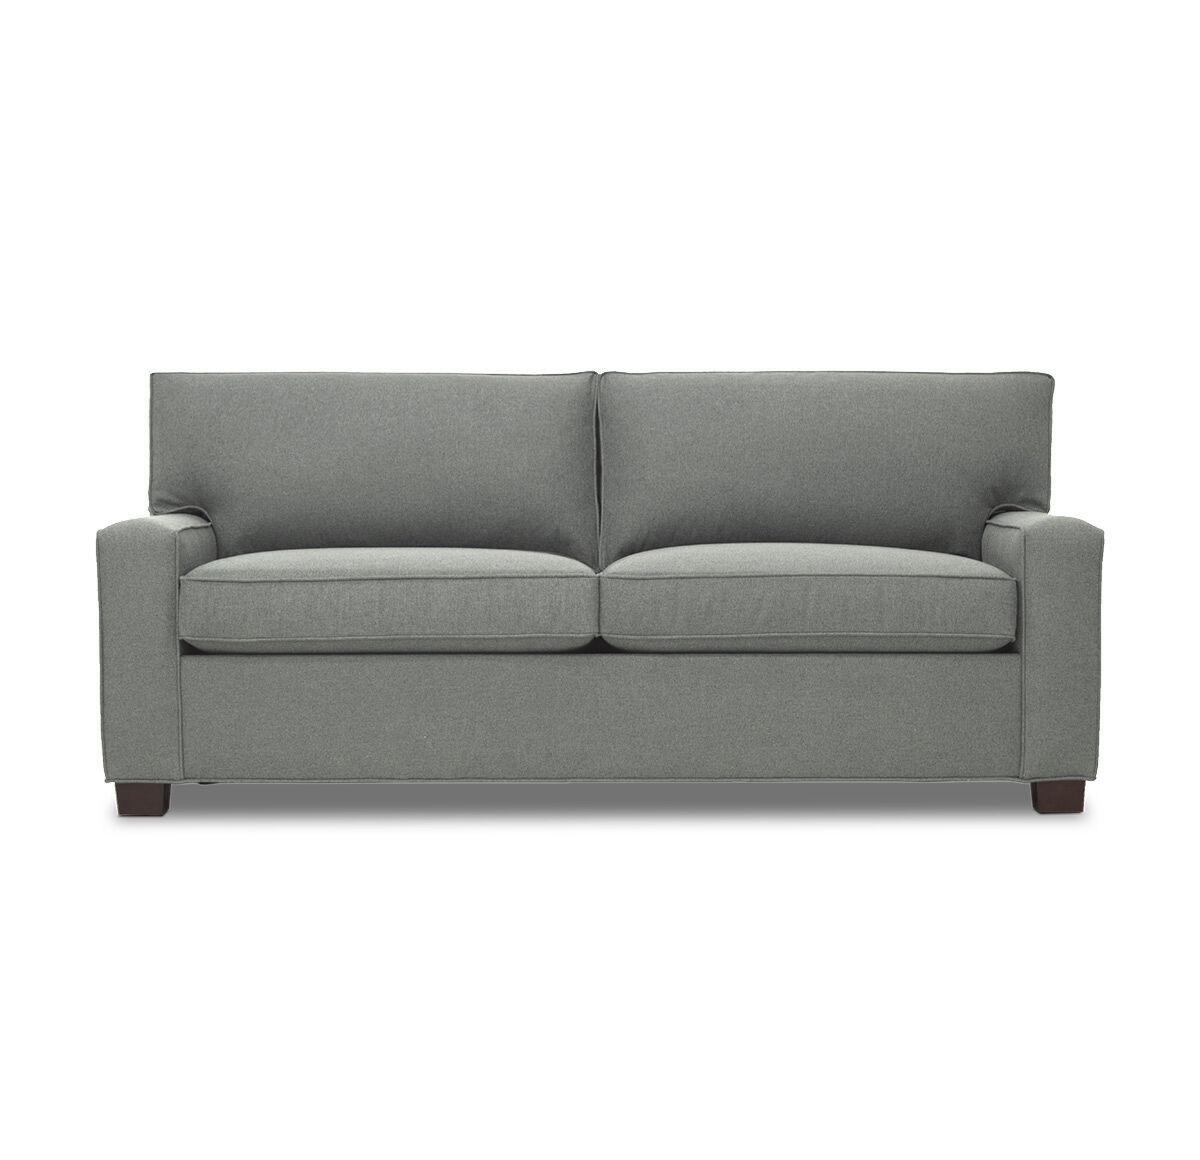 luxe 2 seat sofa slipcover rochester west elm reviews alex queen sleeper hi res